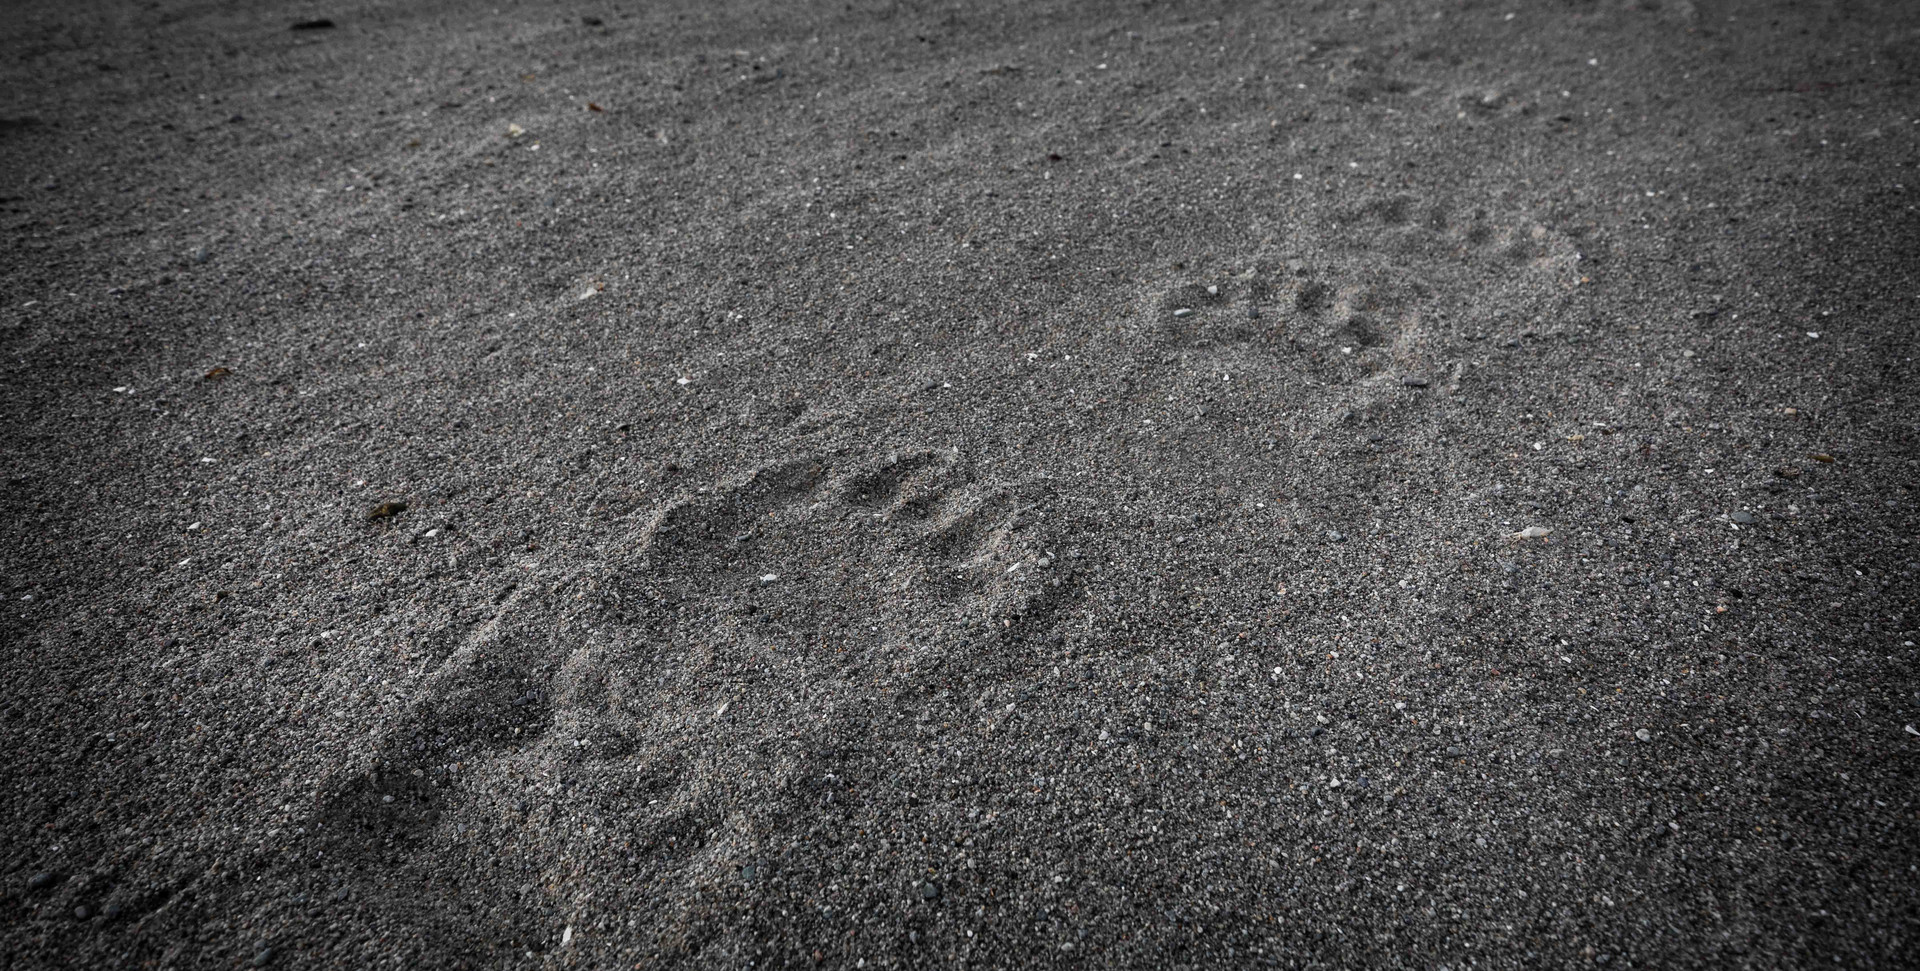 Polar Bear footprints in Svalbard by Chase Teron